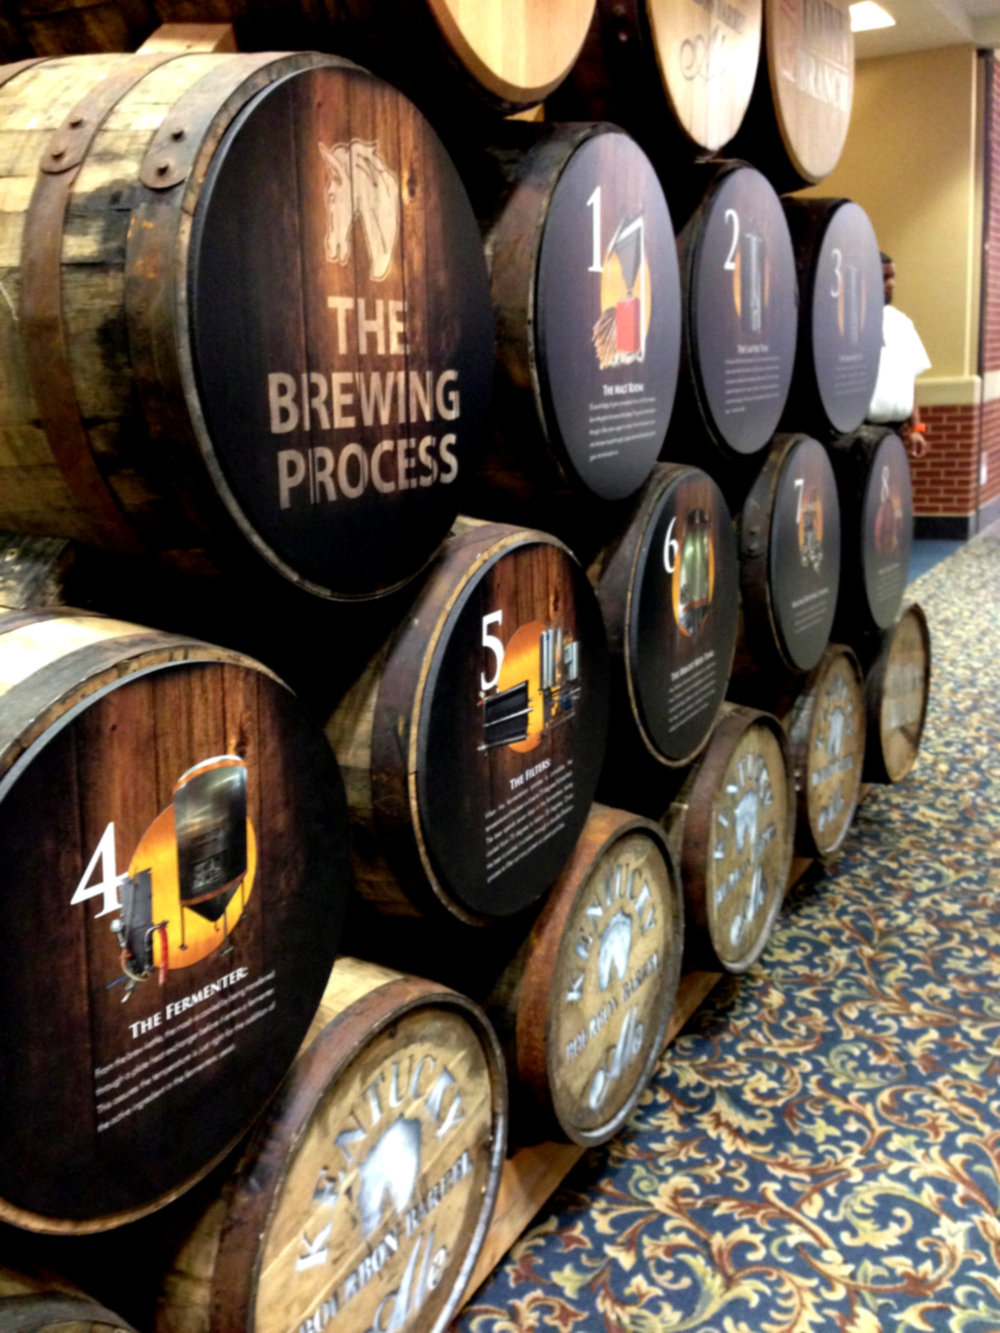 Barrels illustrating the brewing process for Kentucky Bourbon Barrel Ale (Alltech Craft Brews and Food Fest 2014)